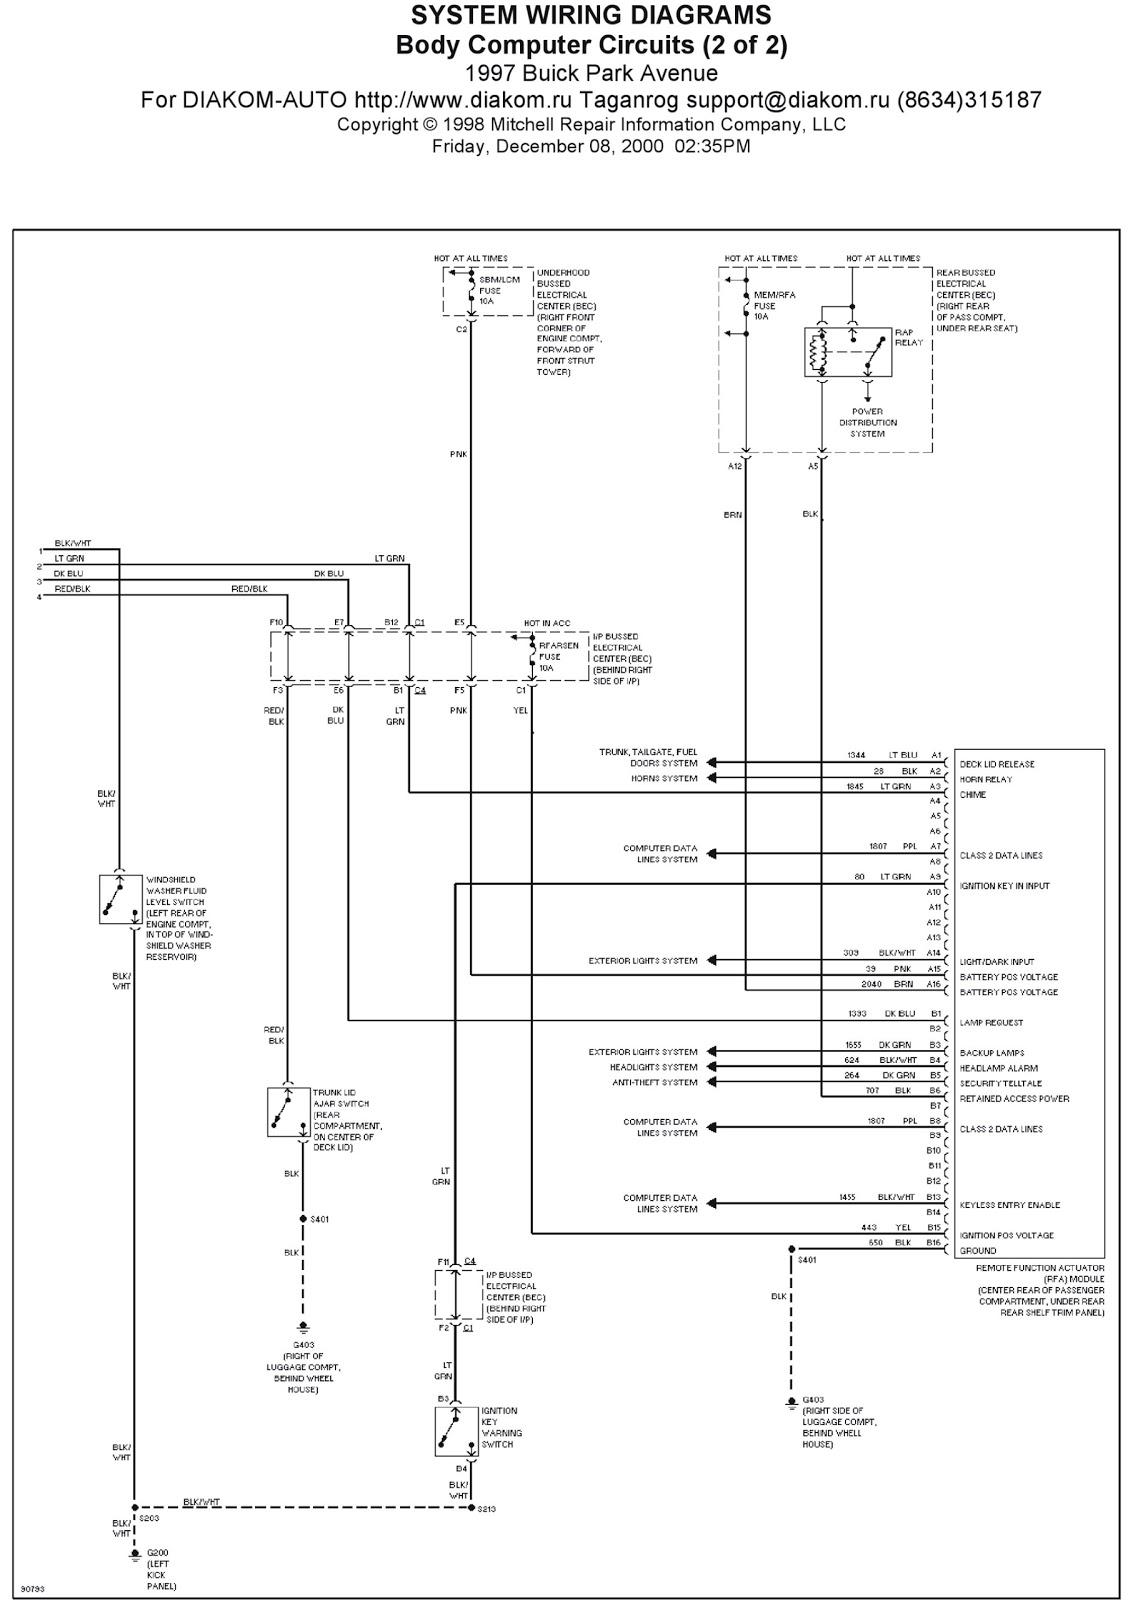 1997 buick lesabre wiring diagram 1985 chevy truck radio park avenue system diagrams body